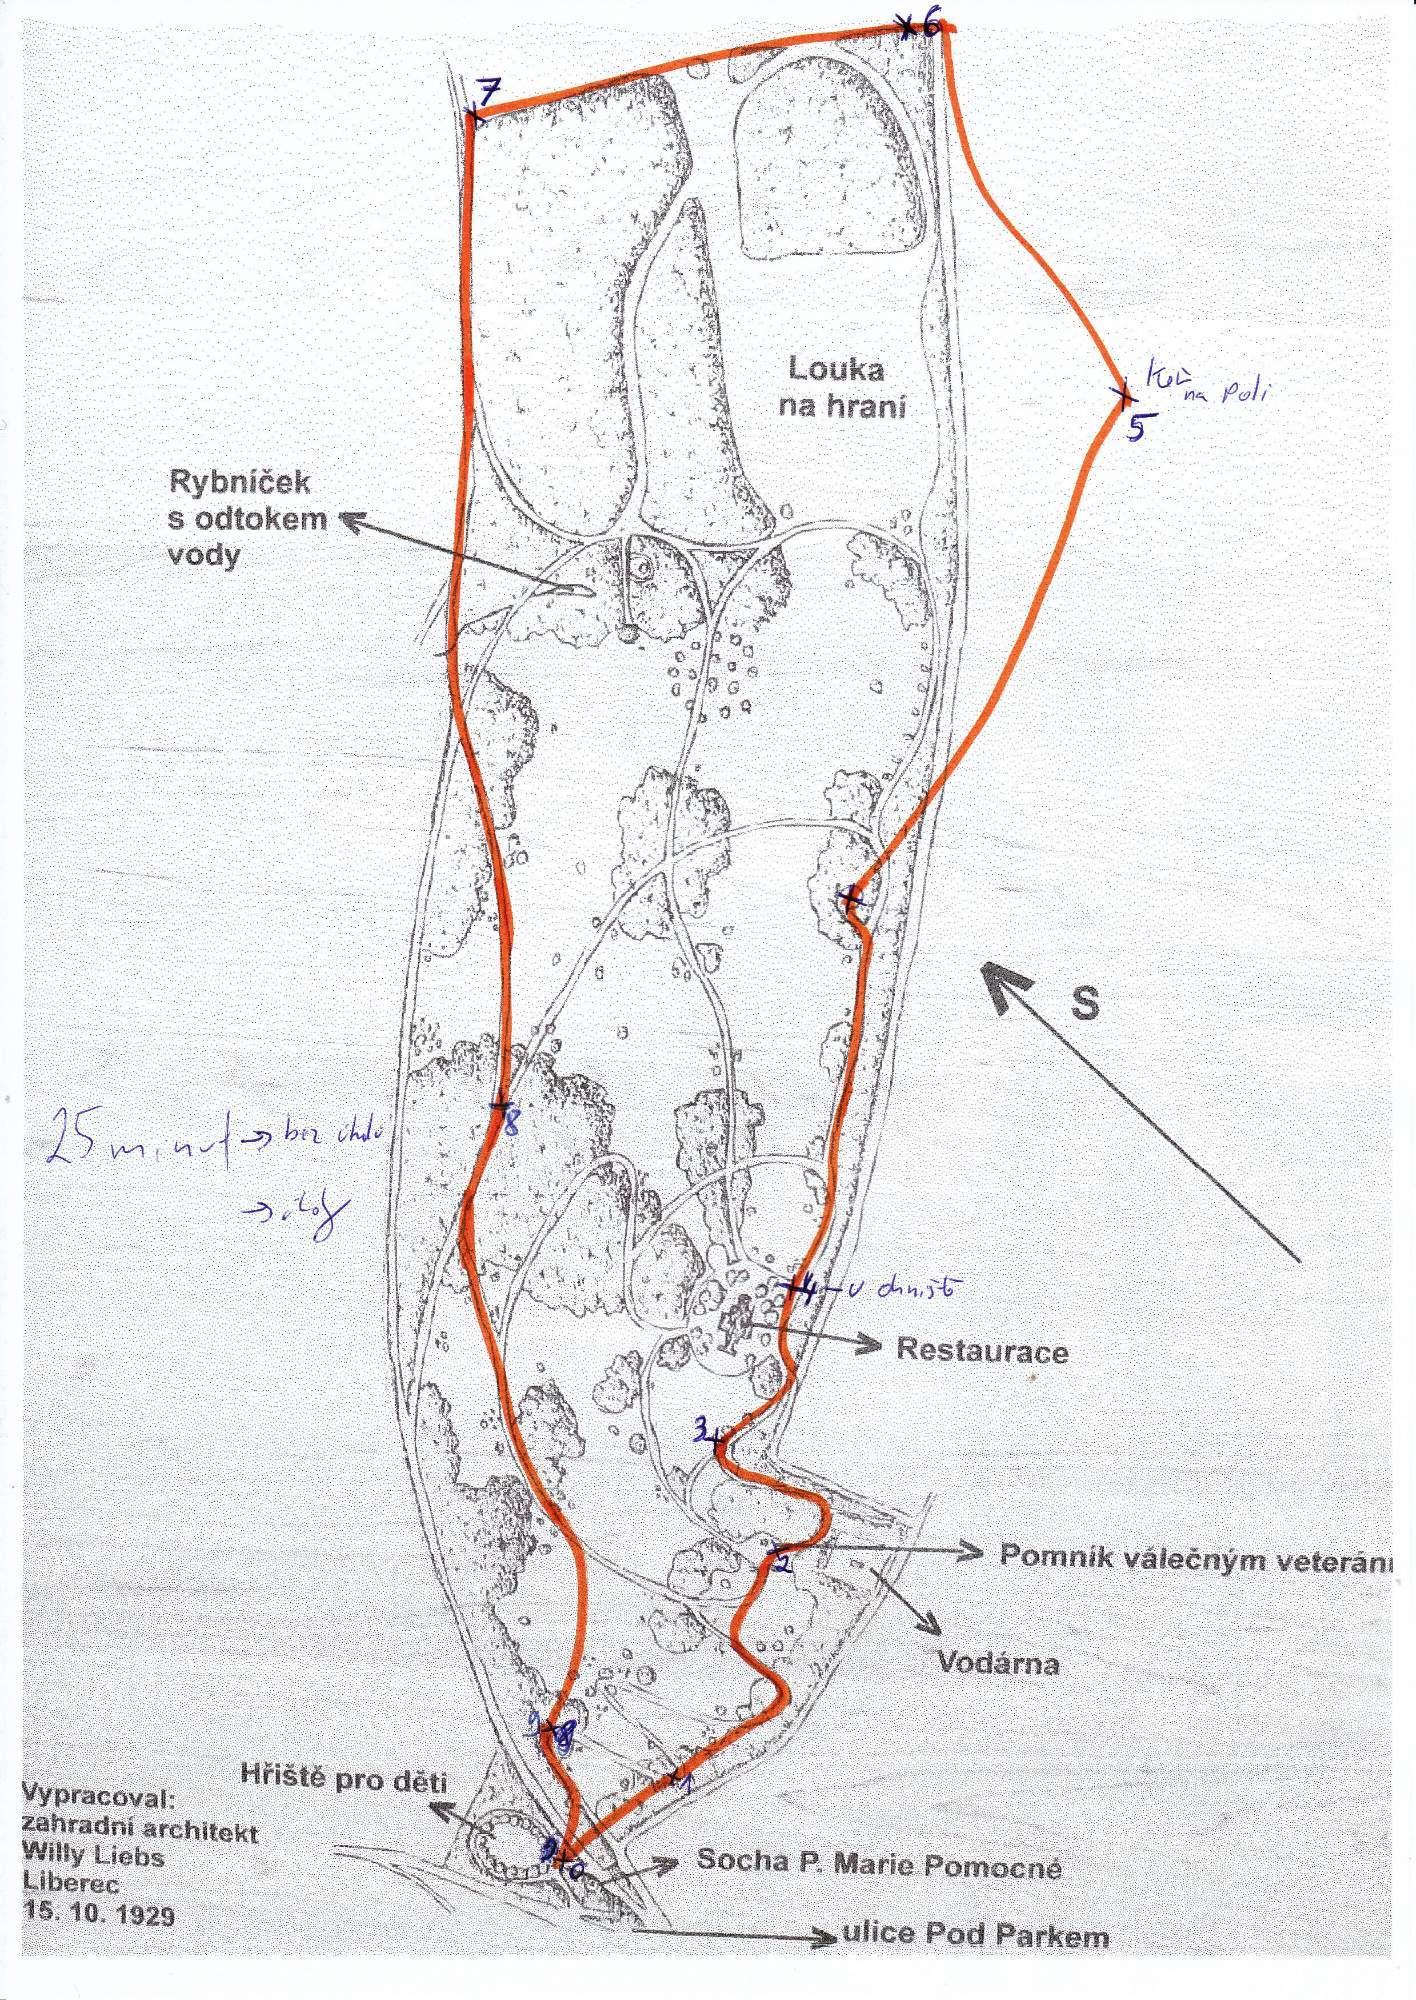 2010 04 24 Strediskove Kolo Zvas Pevnost Boyard